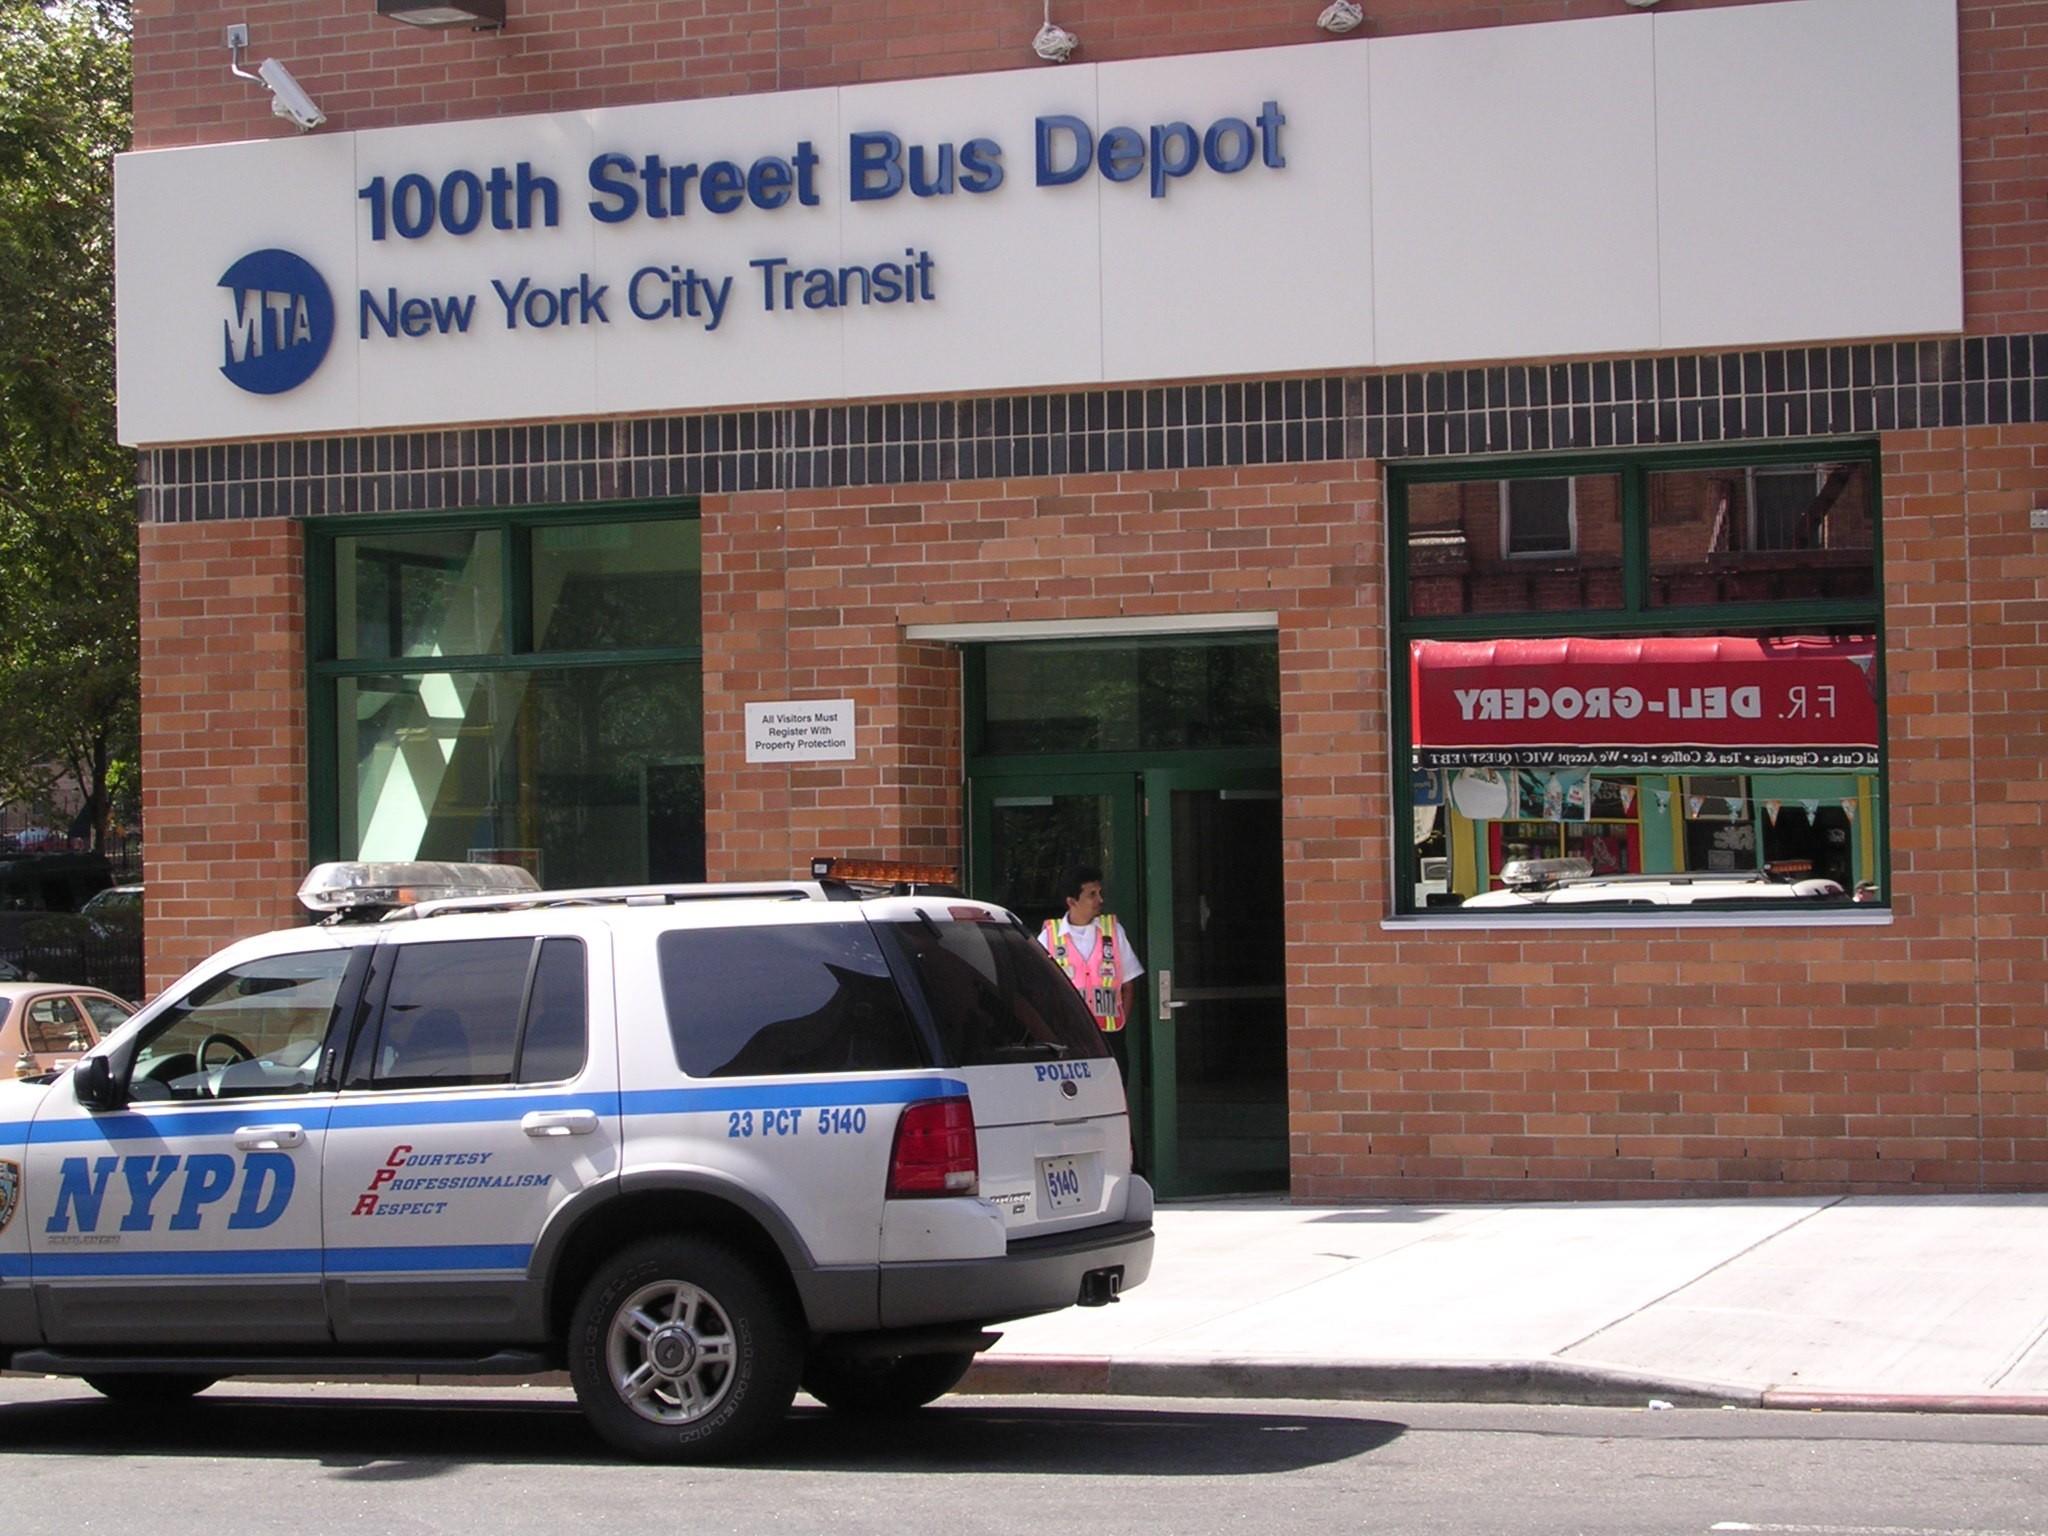 100th_Street_Bus_Depot.jpg